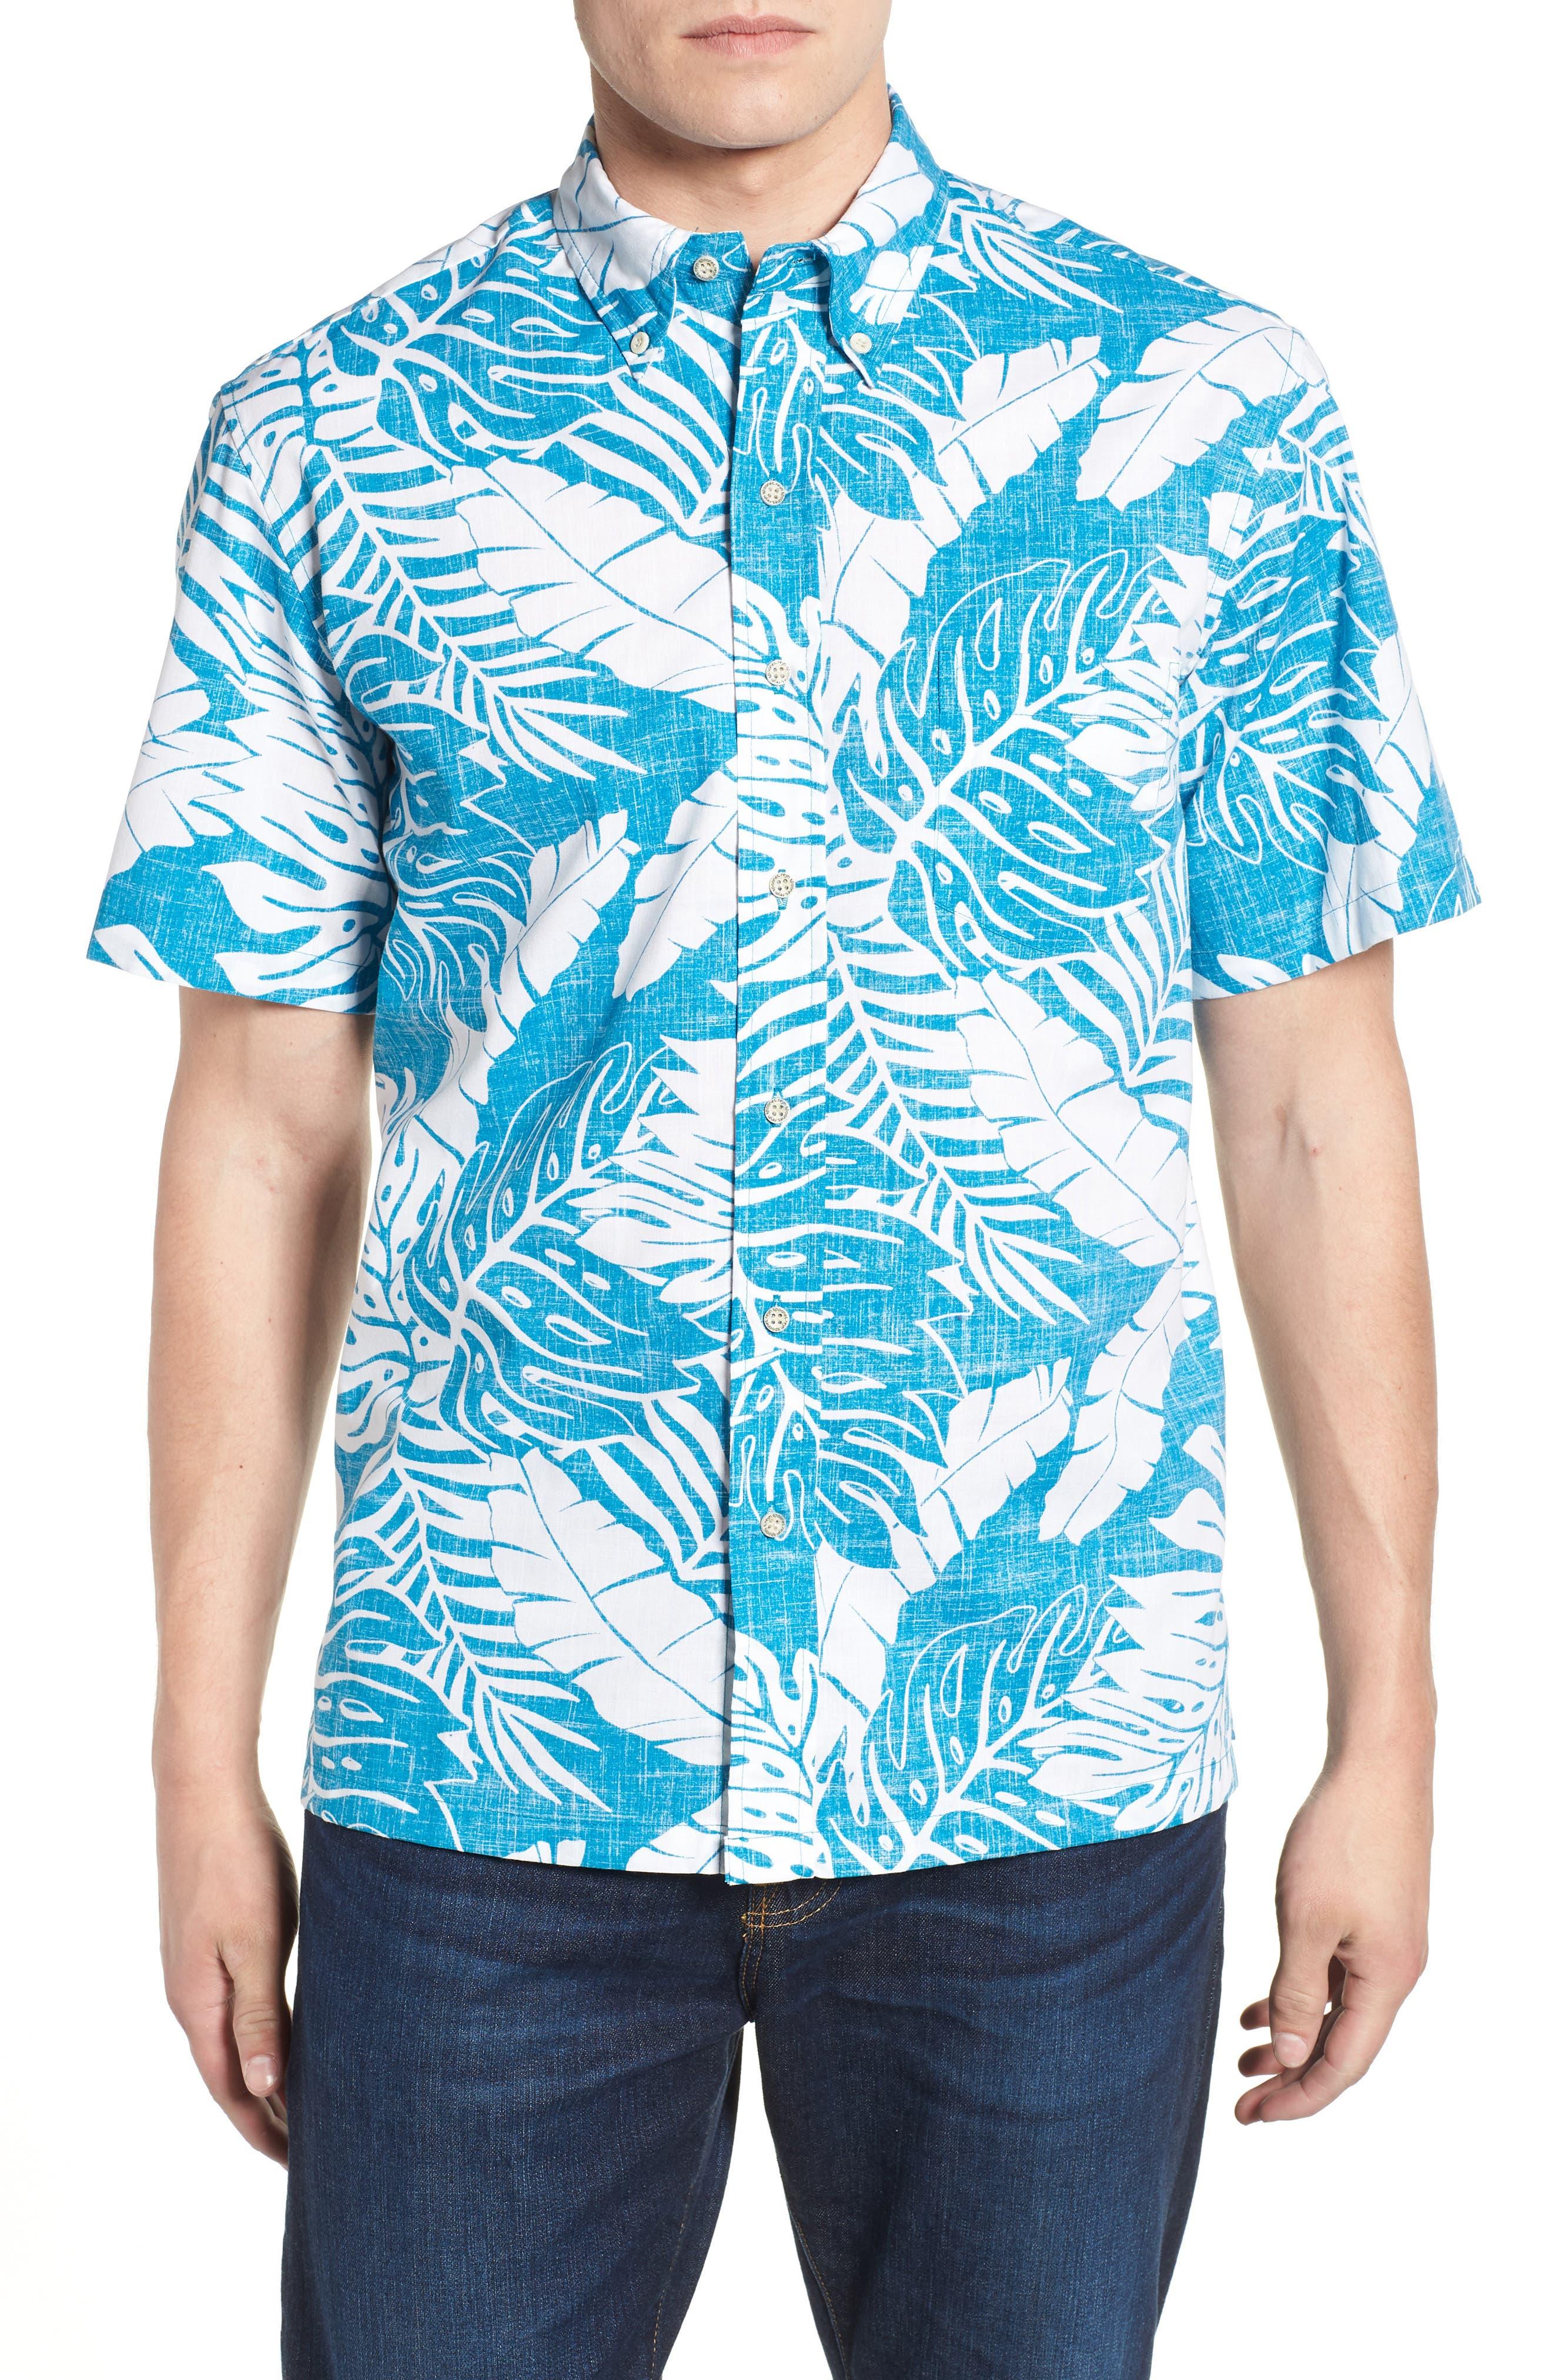 Avenue Falls Classic Fit Sport Shirt,                         Main,                         color, Blue